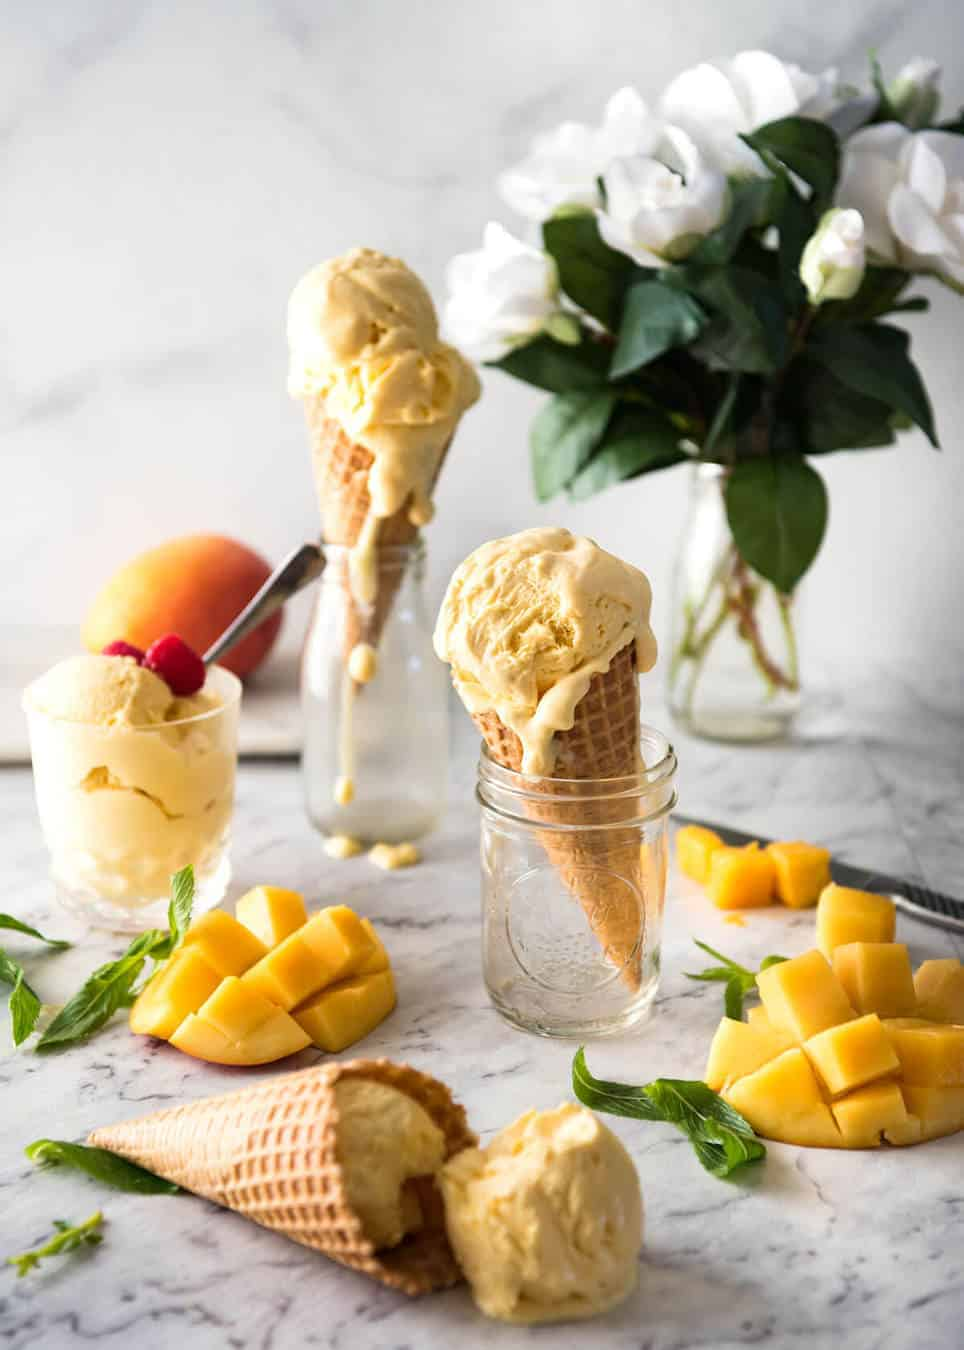 Homemade Mango Ice Cream #icecreammaker